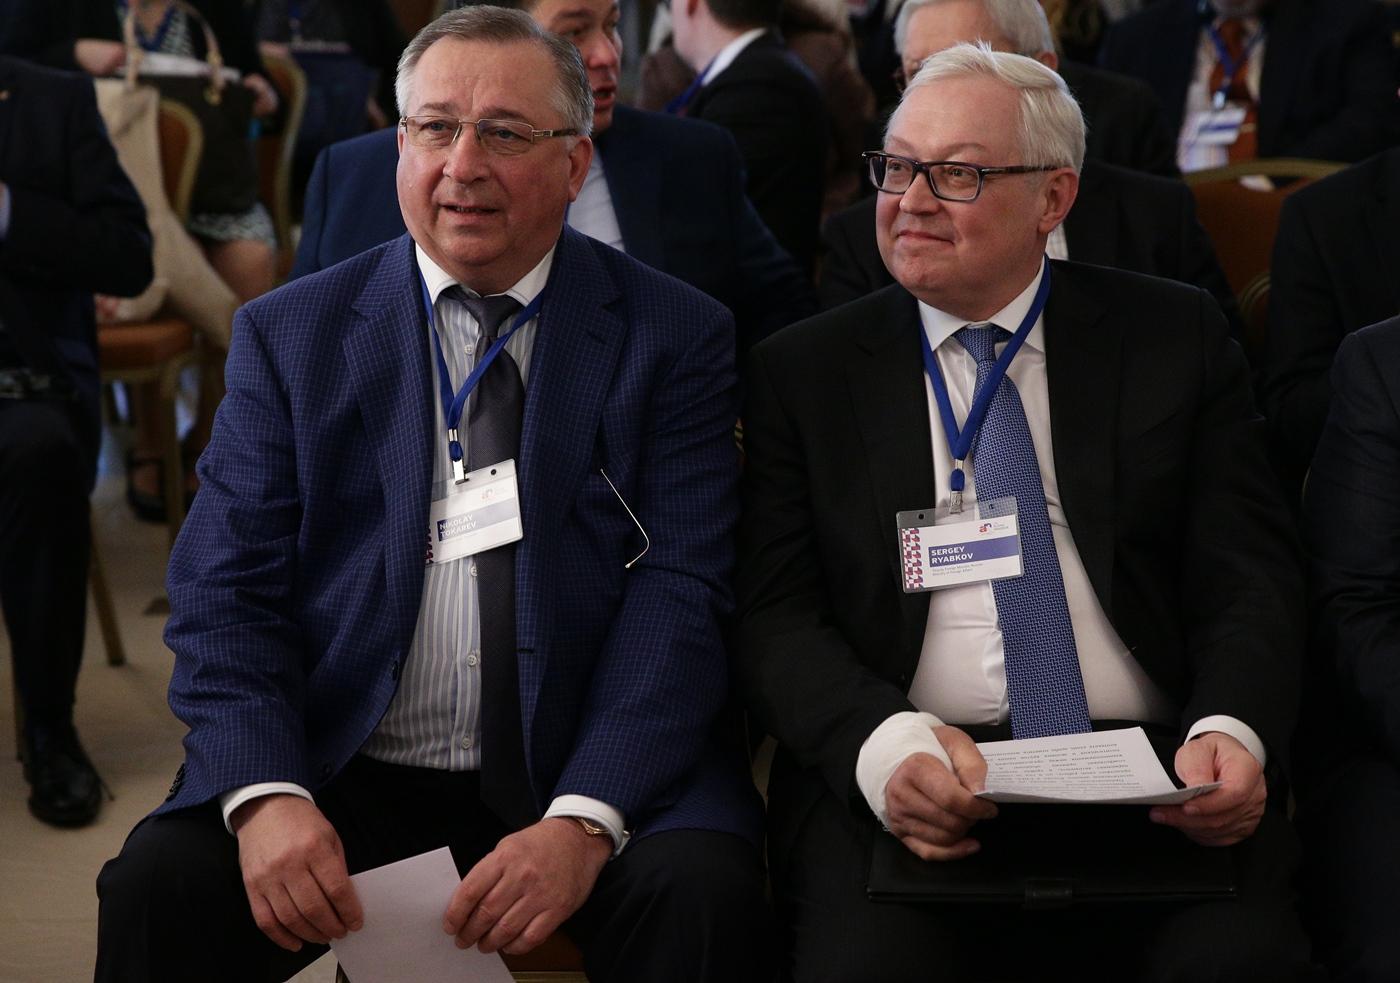 Nikolai Tokarev, President of Transneft, and Sergei Ryabkov, Russian Deputy Foreign Minister. / Mikhail Sinitsyn